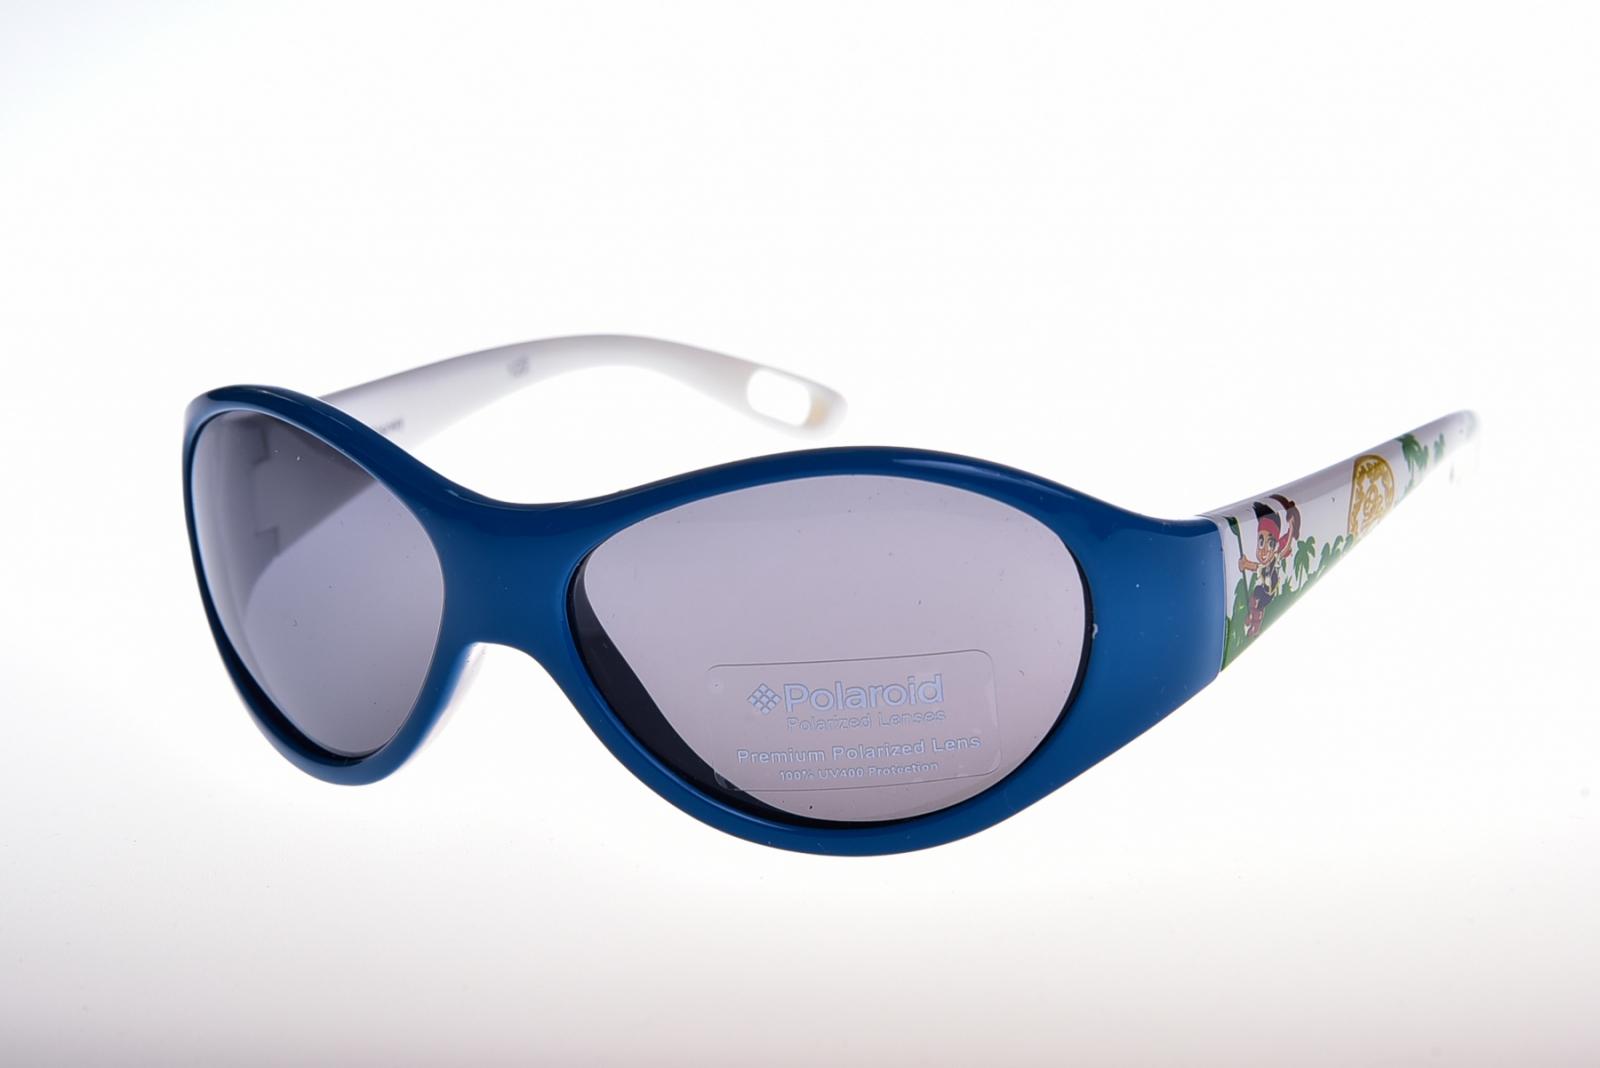 Polaroid Disney D0315C - Slnečné okuliare pre deti 1-3 r.